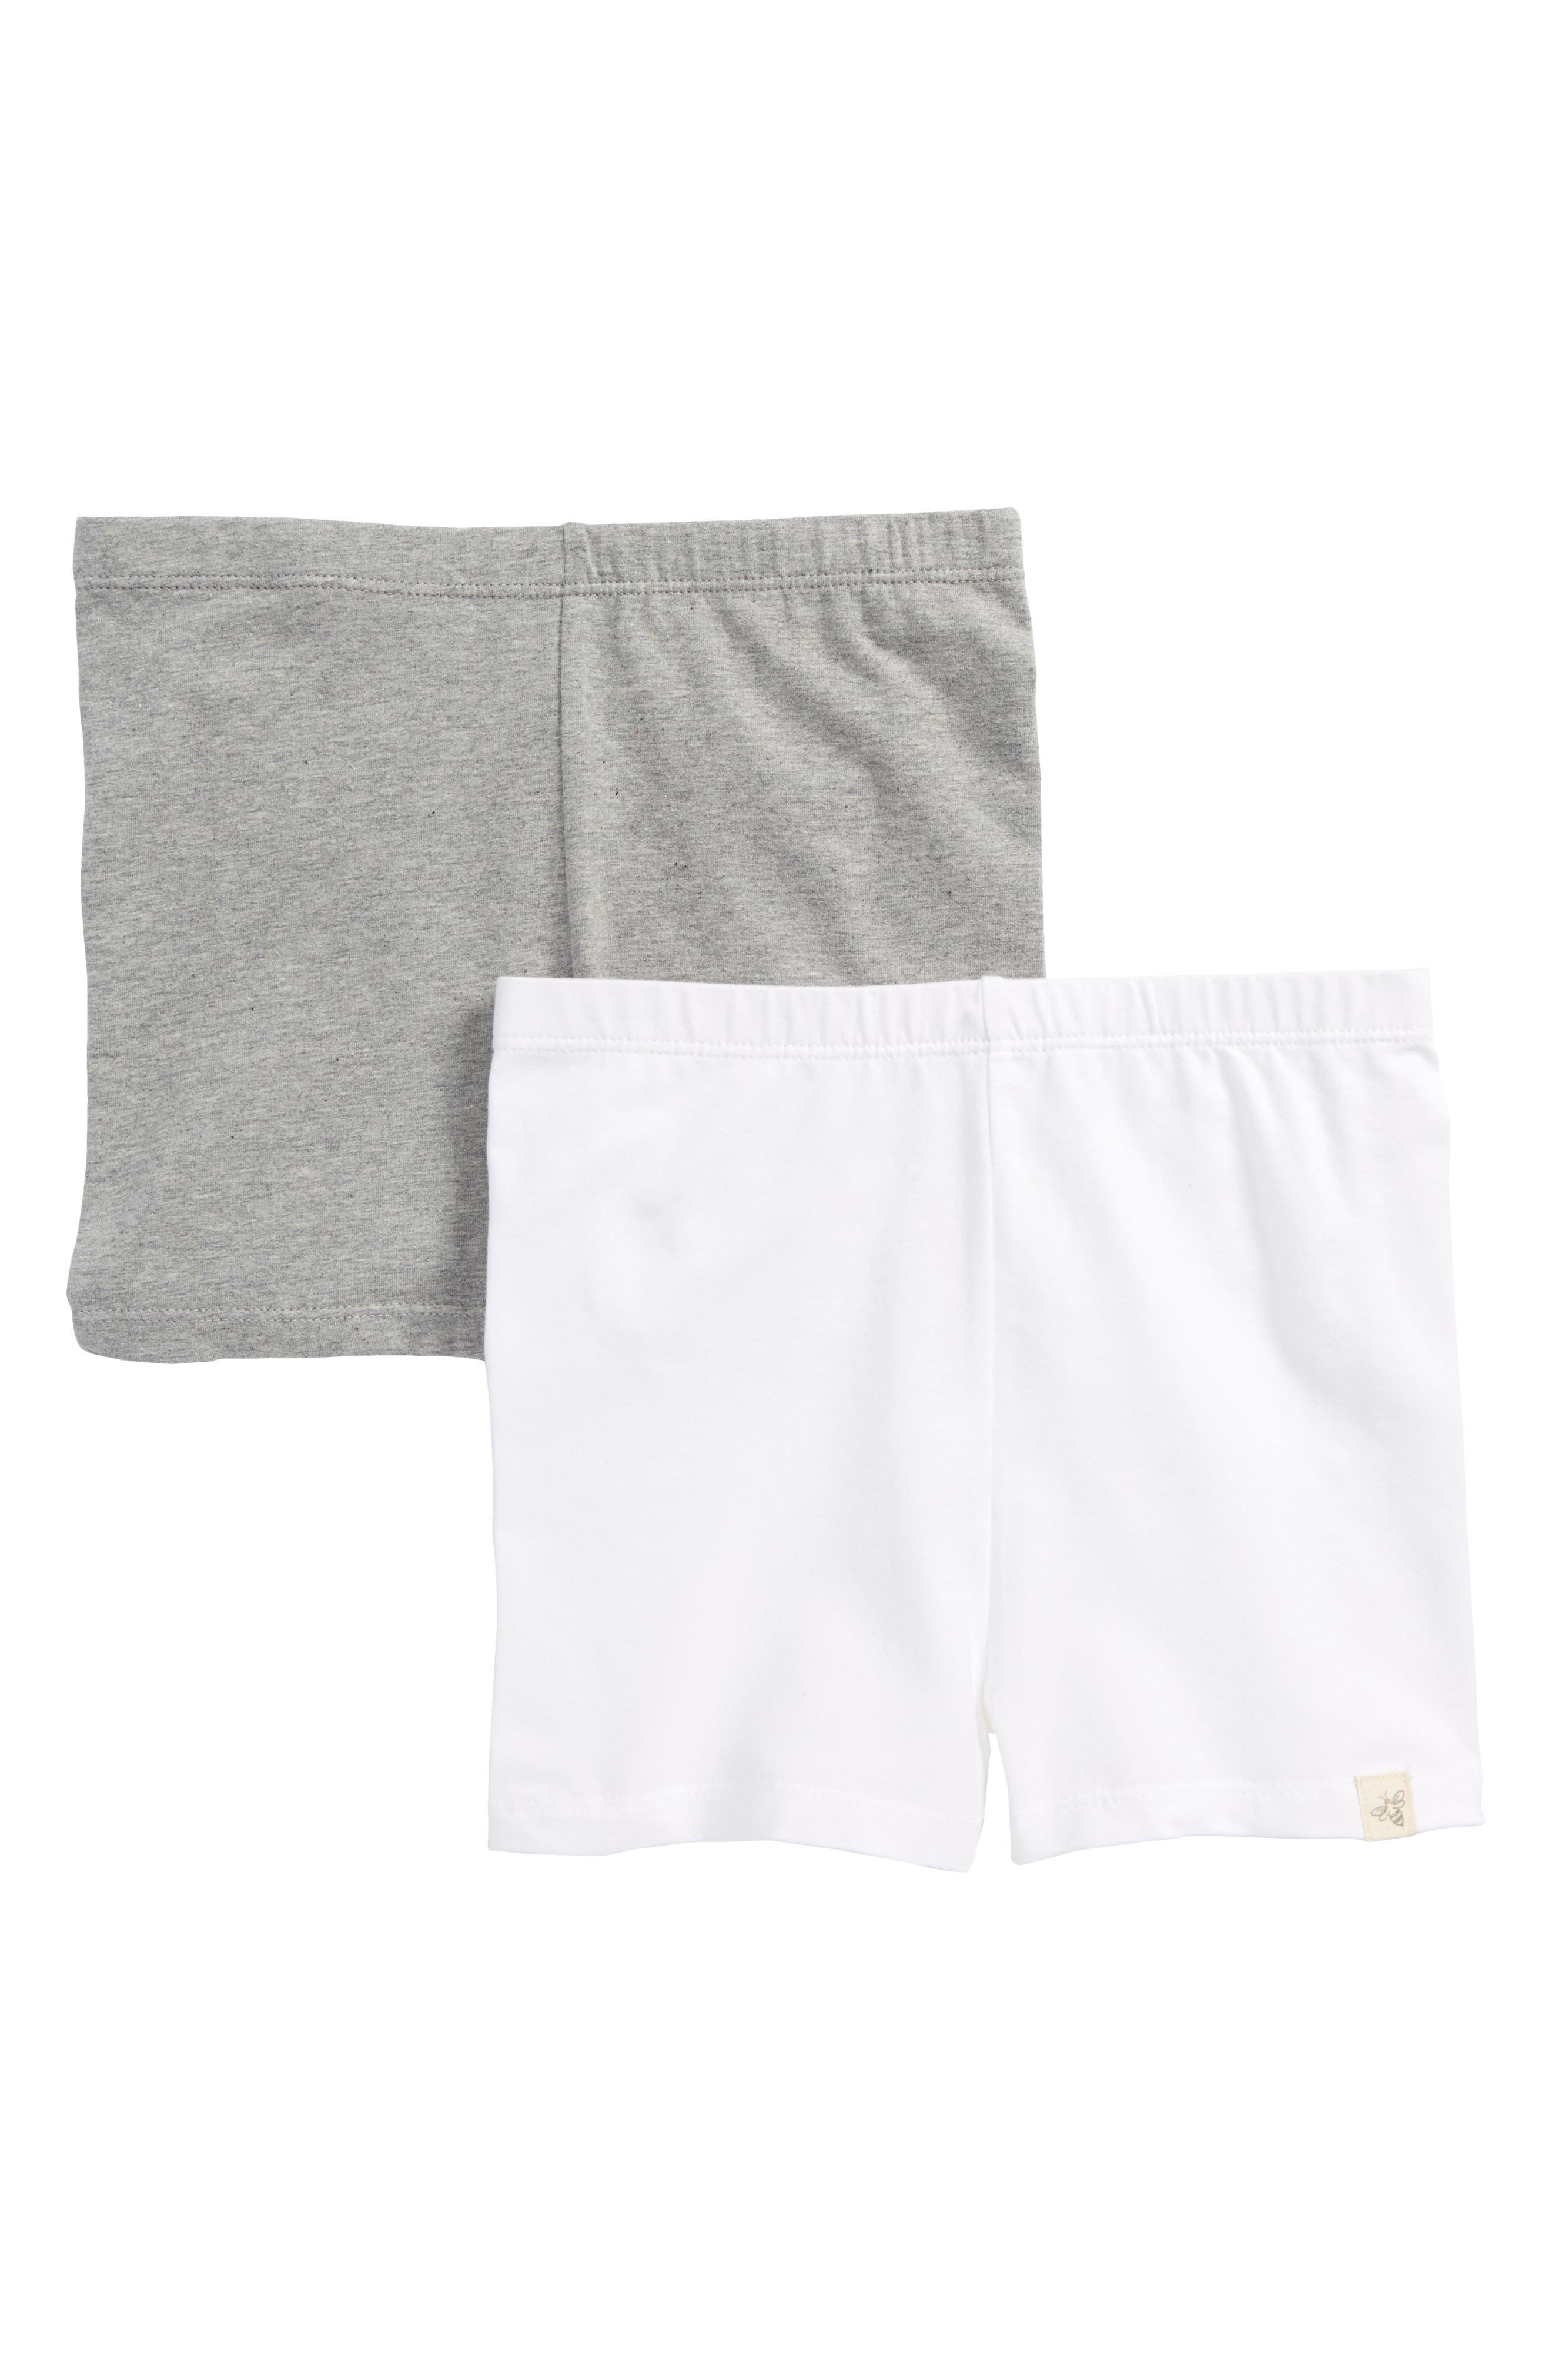 2-Pack Organic Cotton Blend Bike Shorts,                         Main,                         color, 020